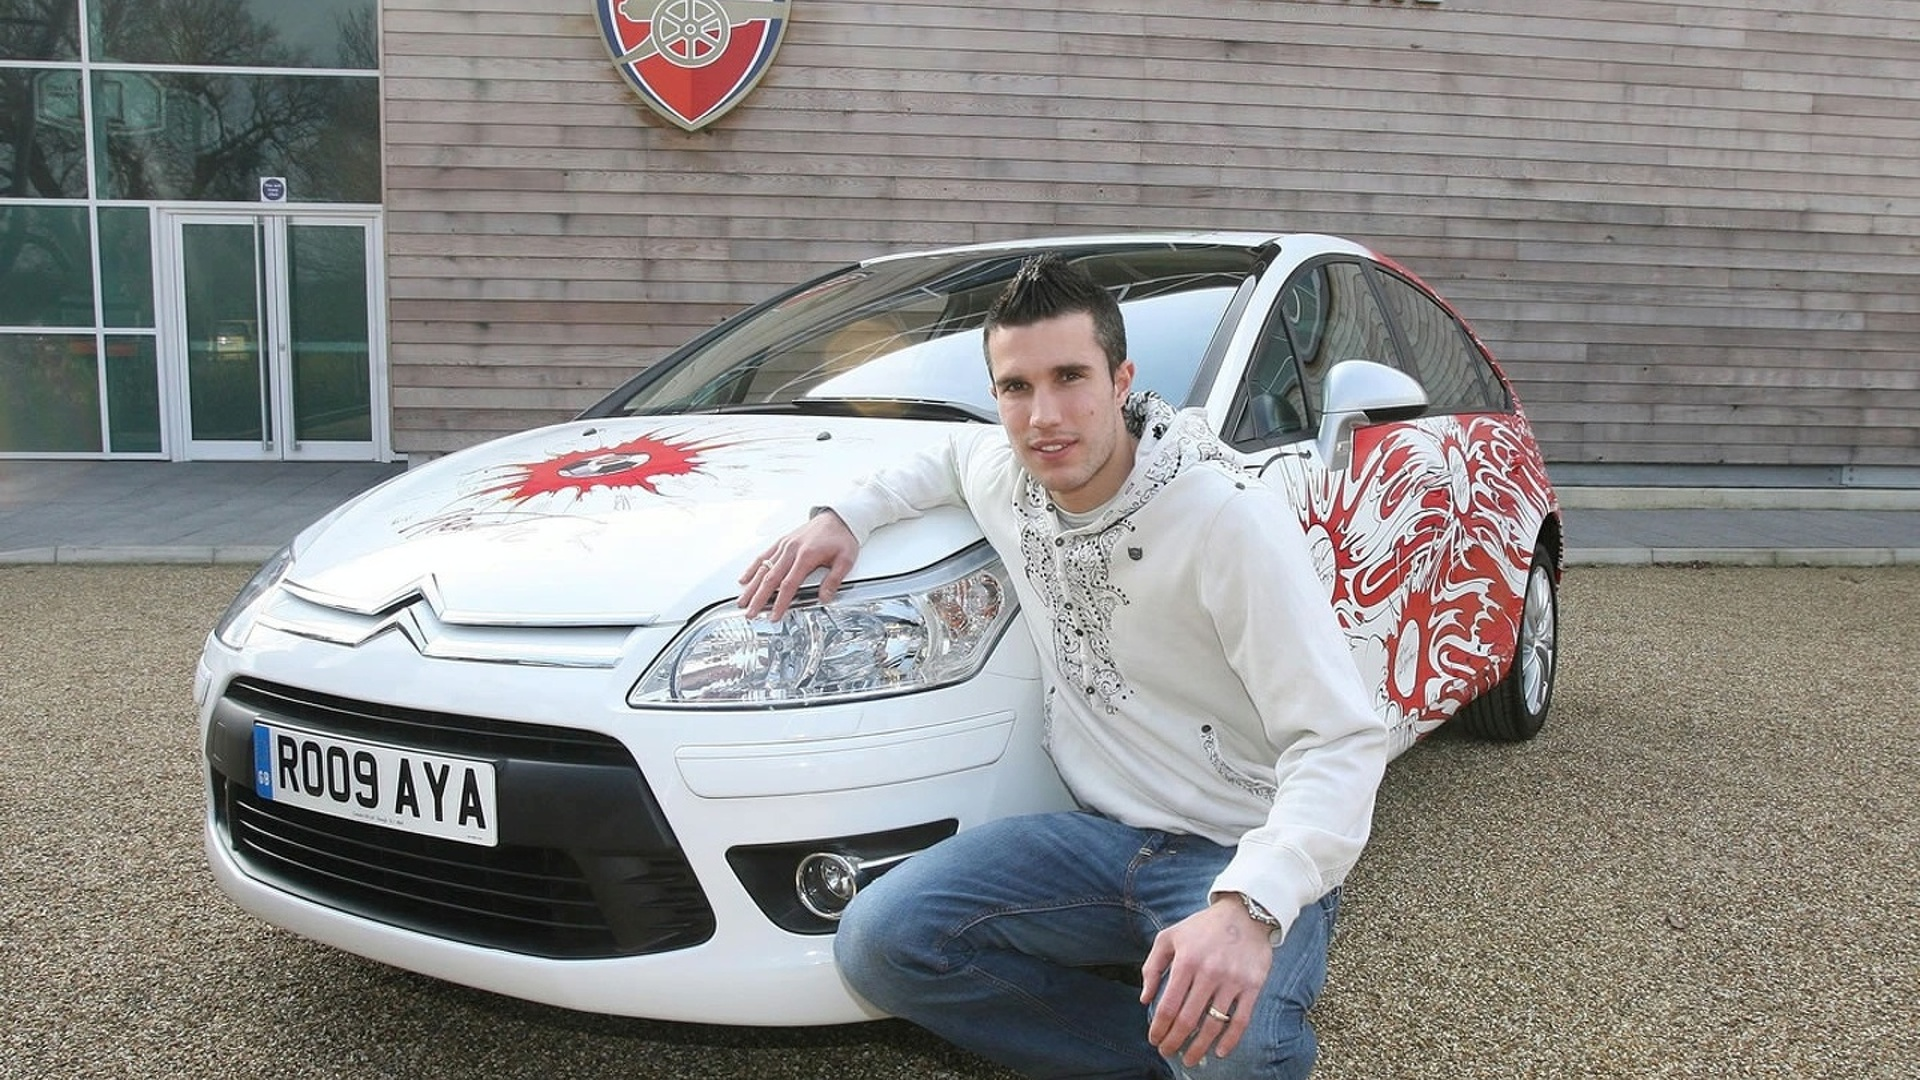 Gerald Scarfe Designs Arsenal Fans' Dream Citroen C4